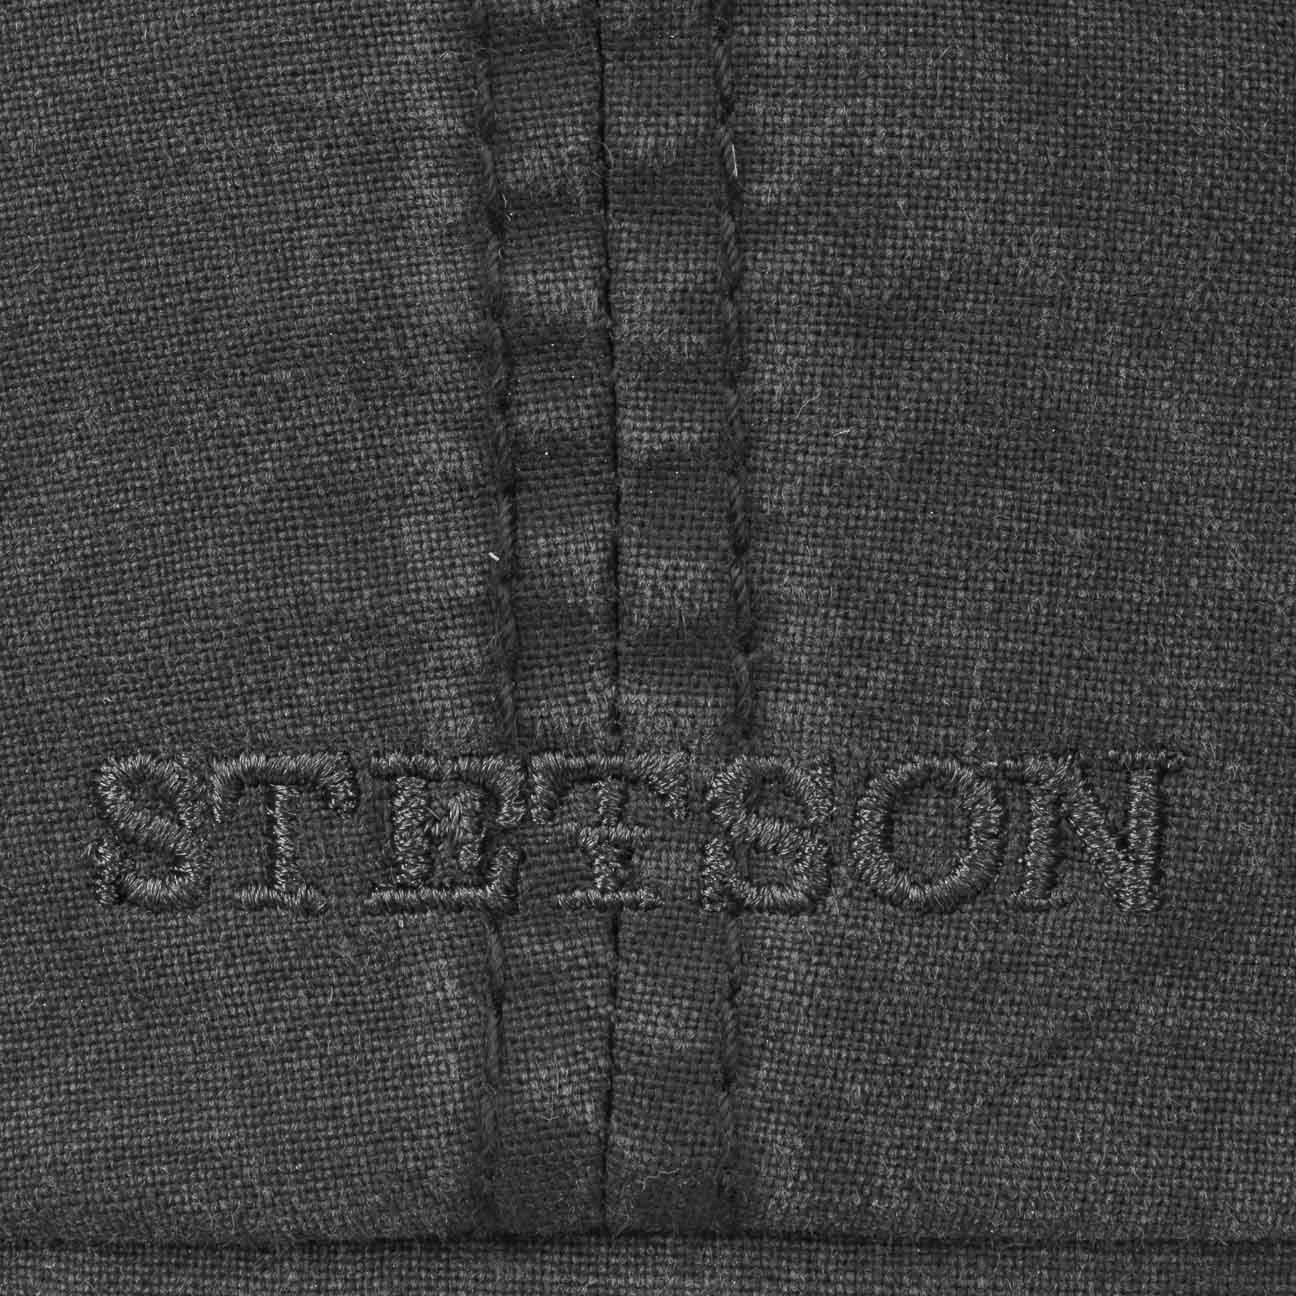 Stetson Organic Cotton Hatteras Bakerboy Cap In Burgundy or Blue 6841106